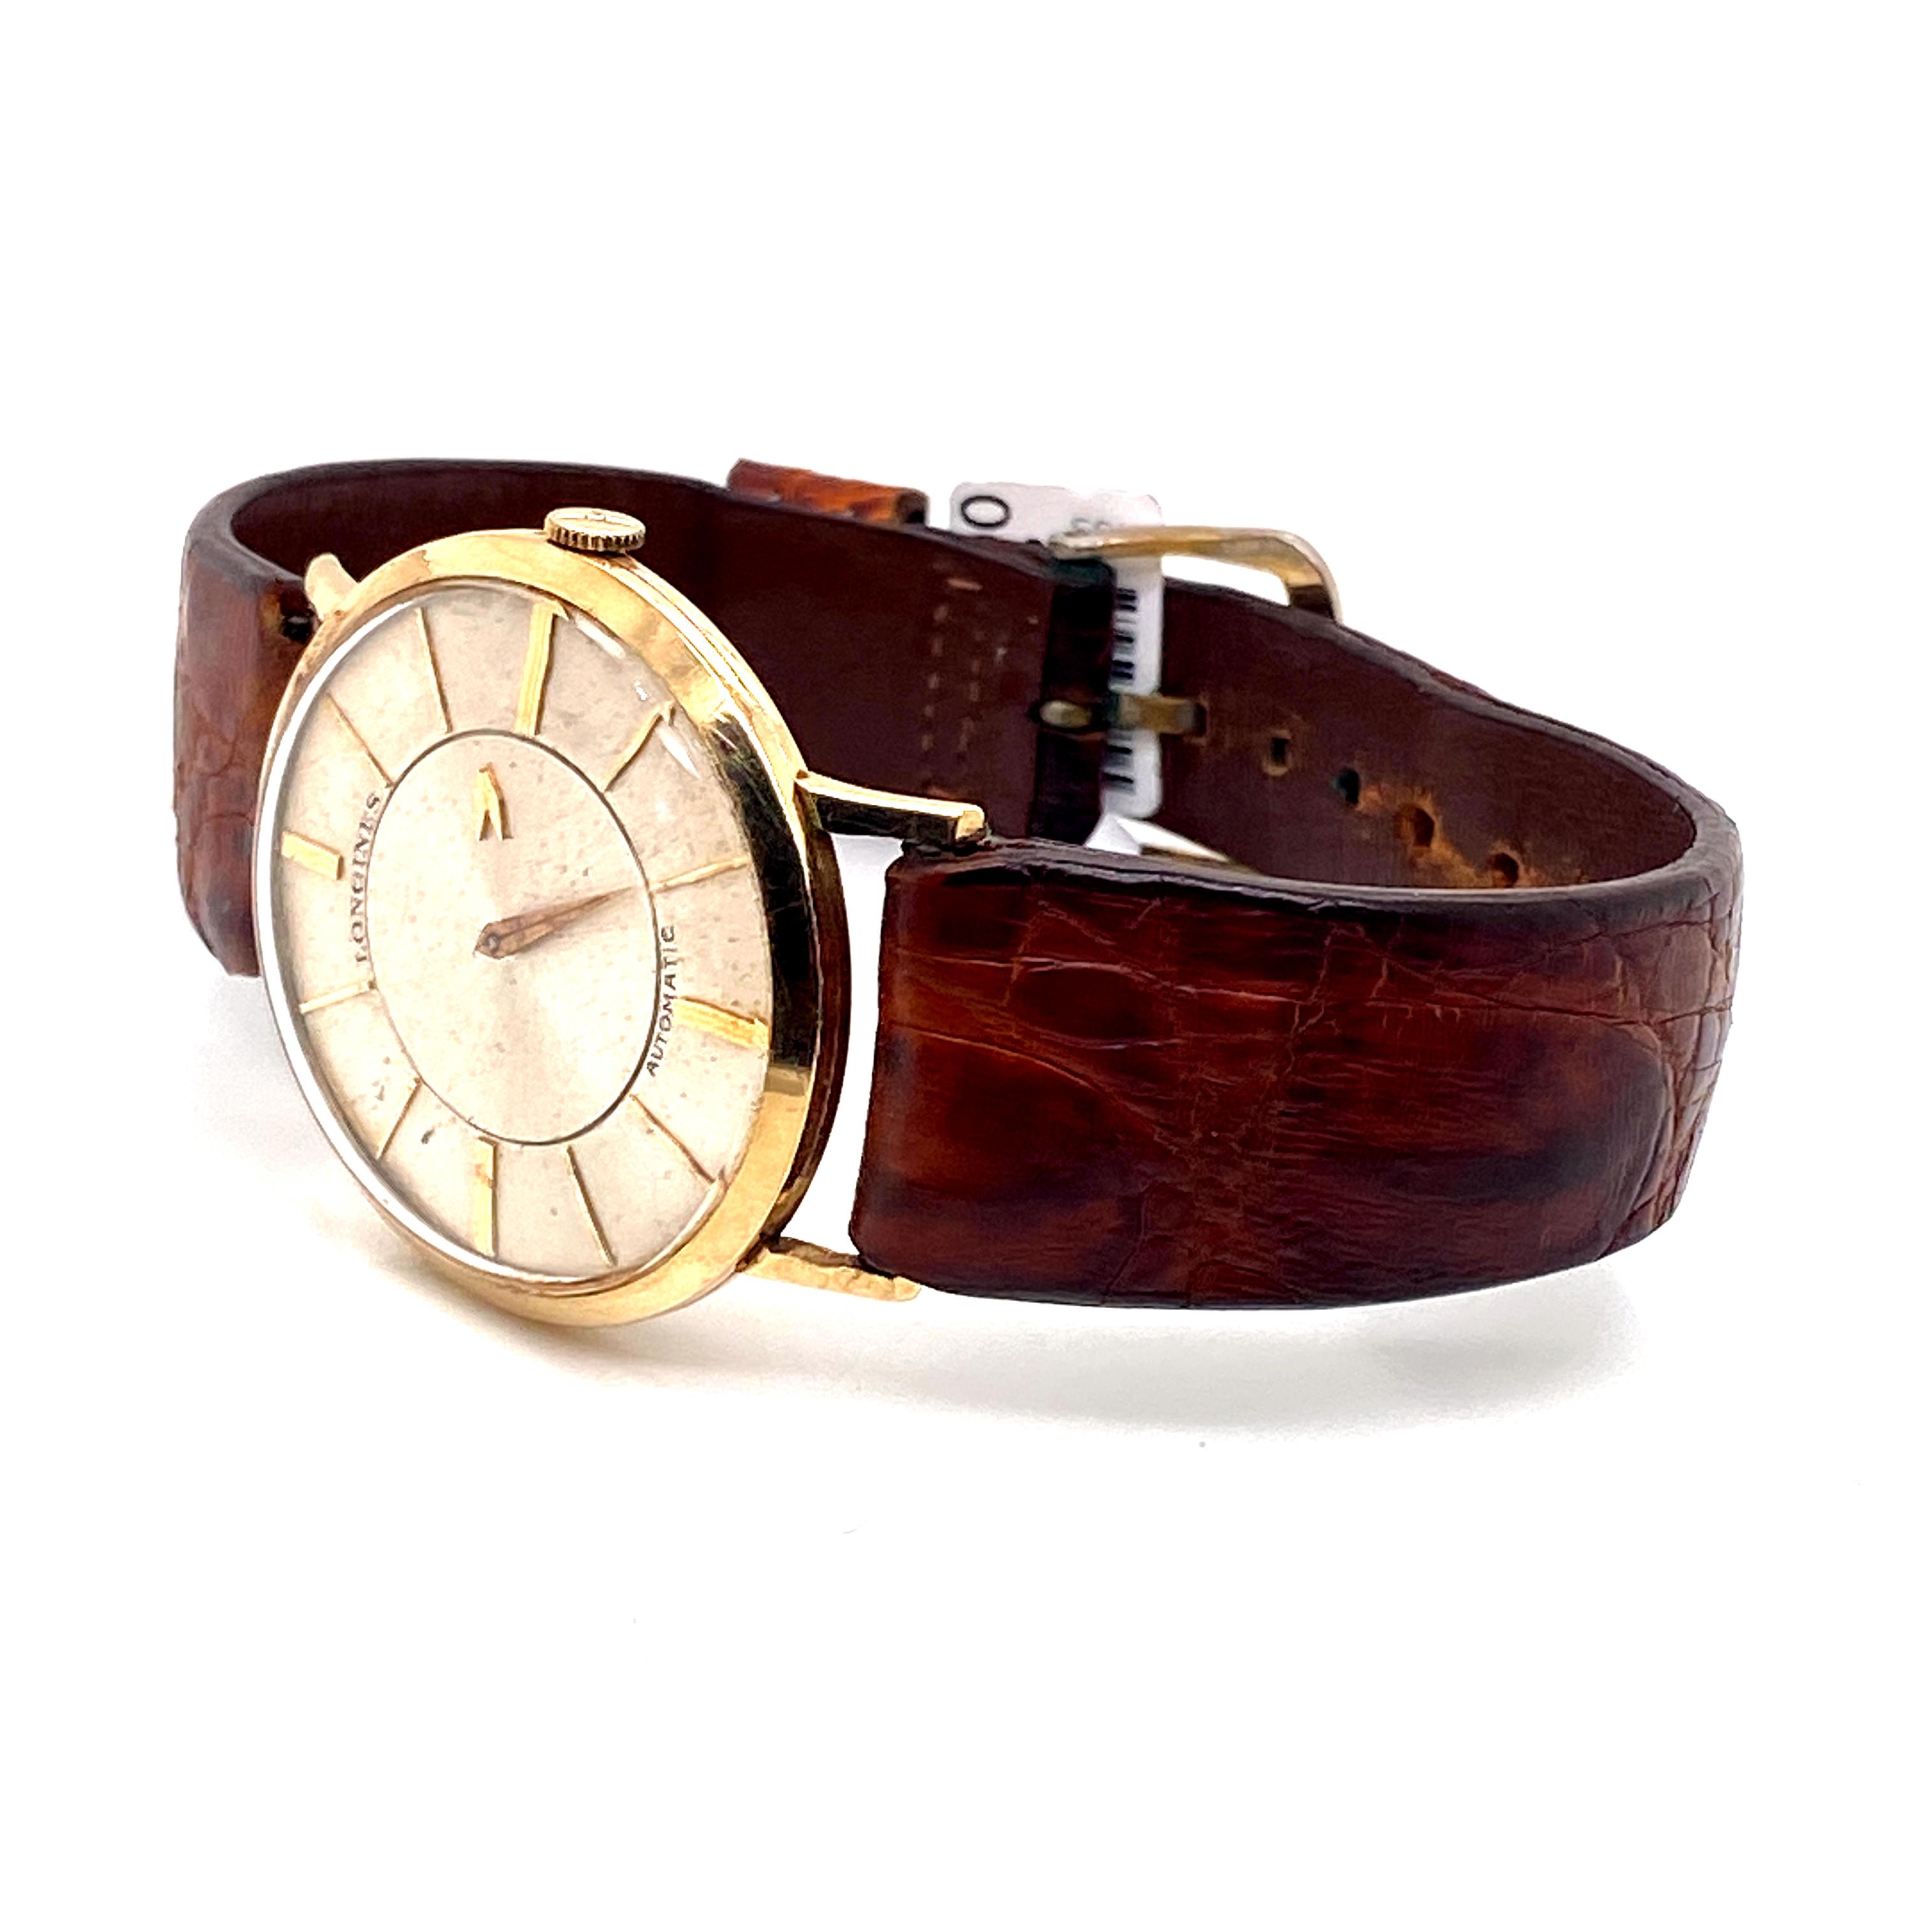 Lot 18 - Longines Mystery Watch